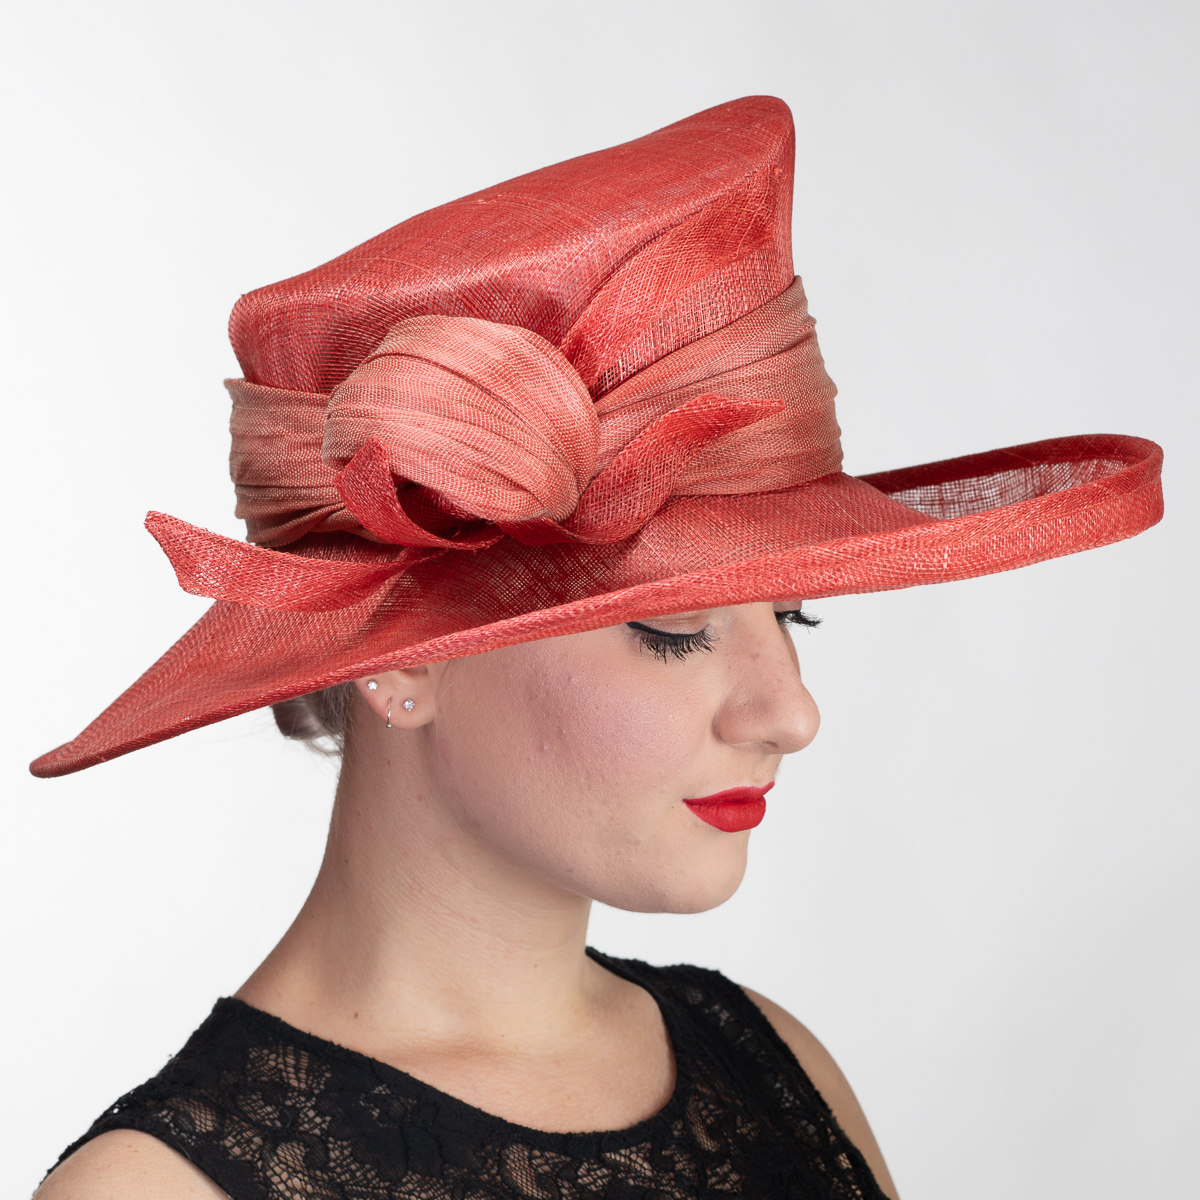 Coral Sculpture Polyhemp Trim Side Sweep Medium Sinamay Hats-102580-CORAL-  Sun Yorkos  5016e623200